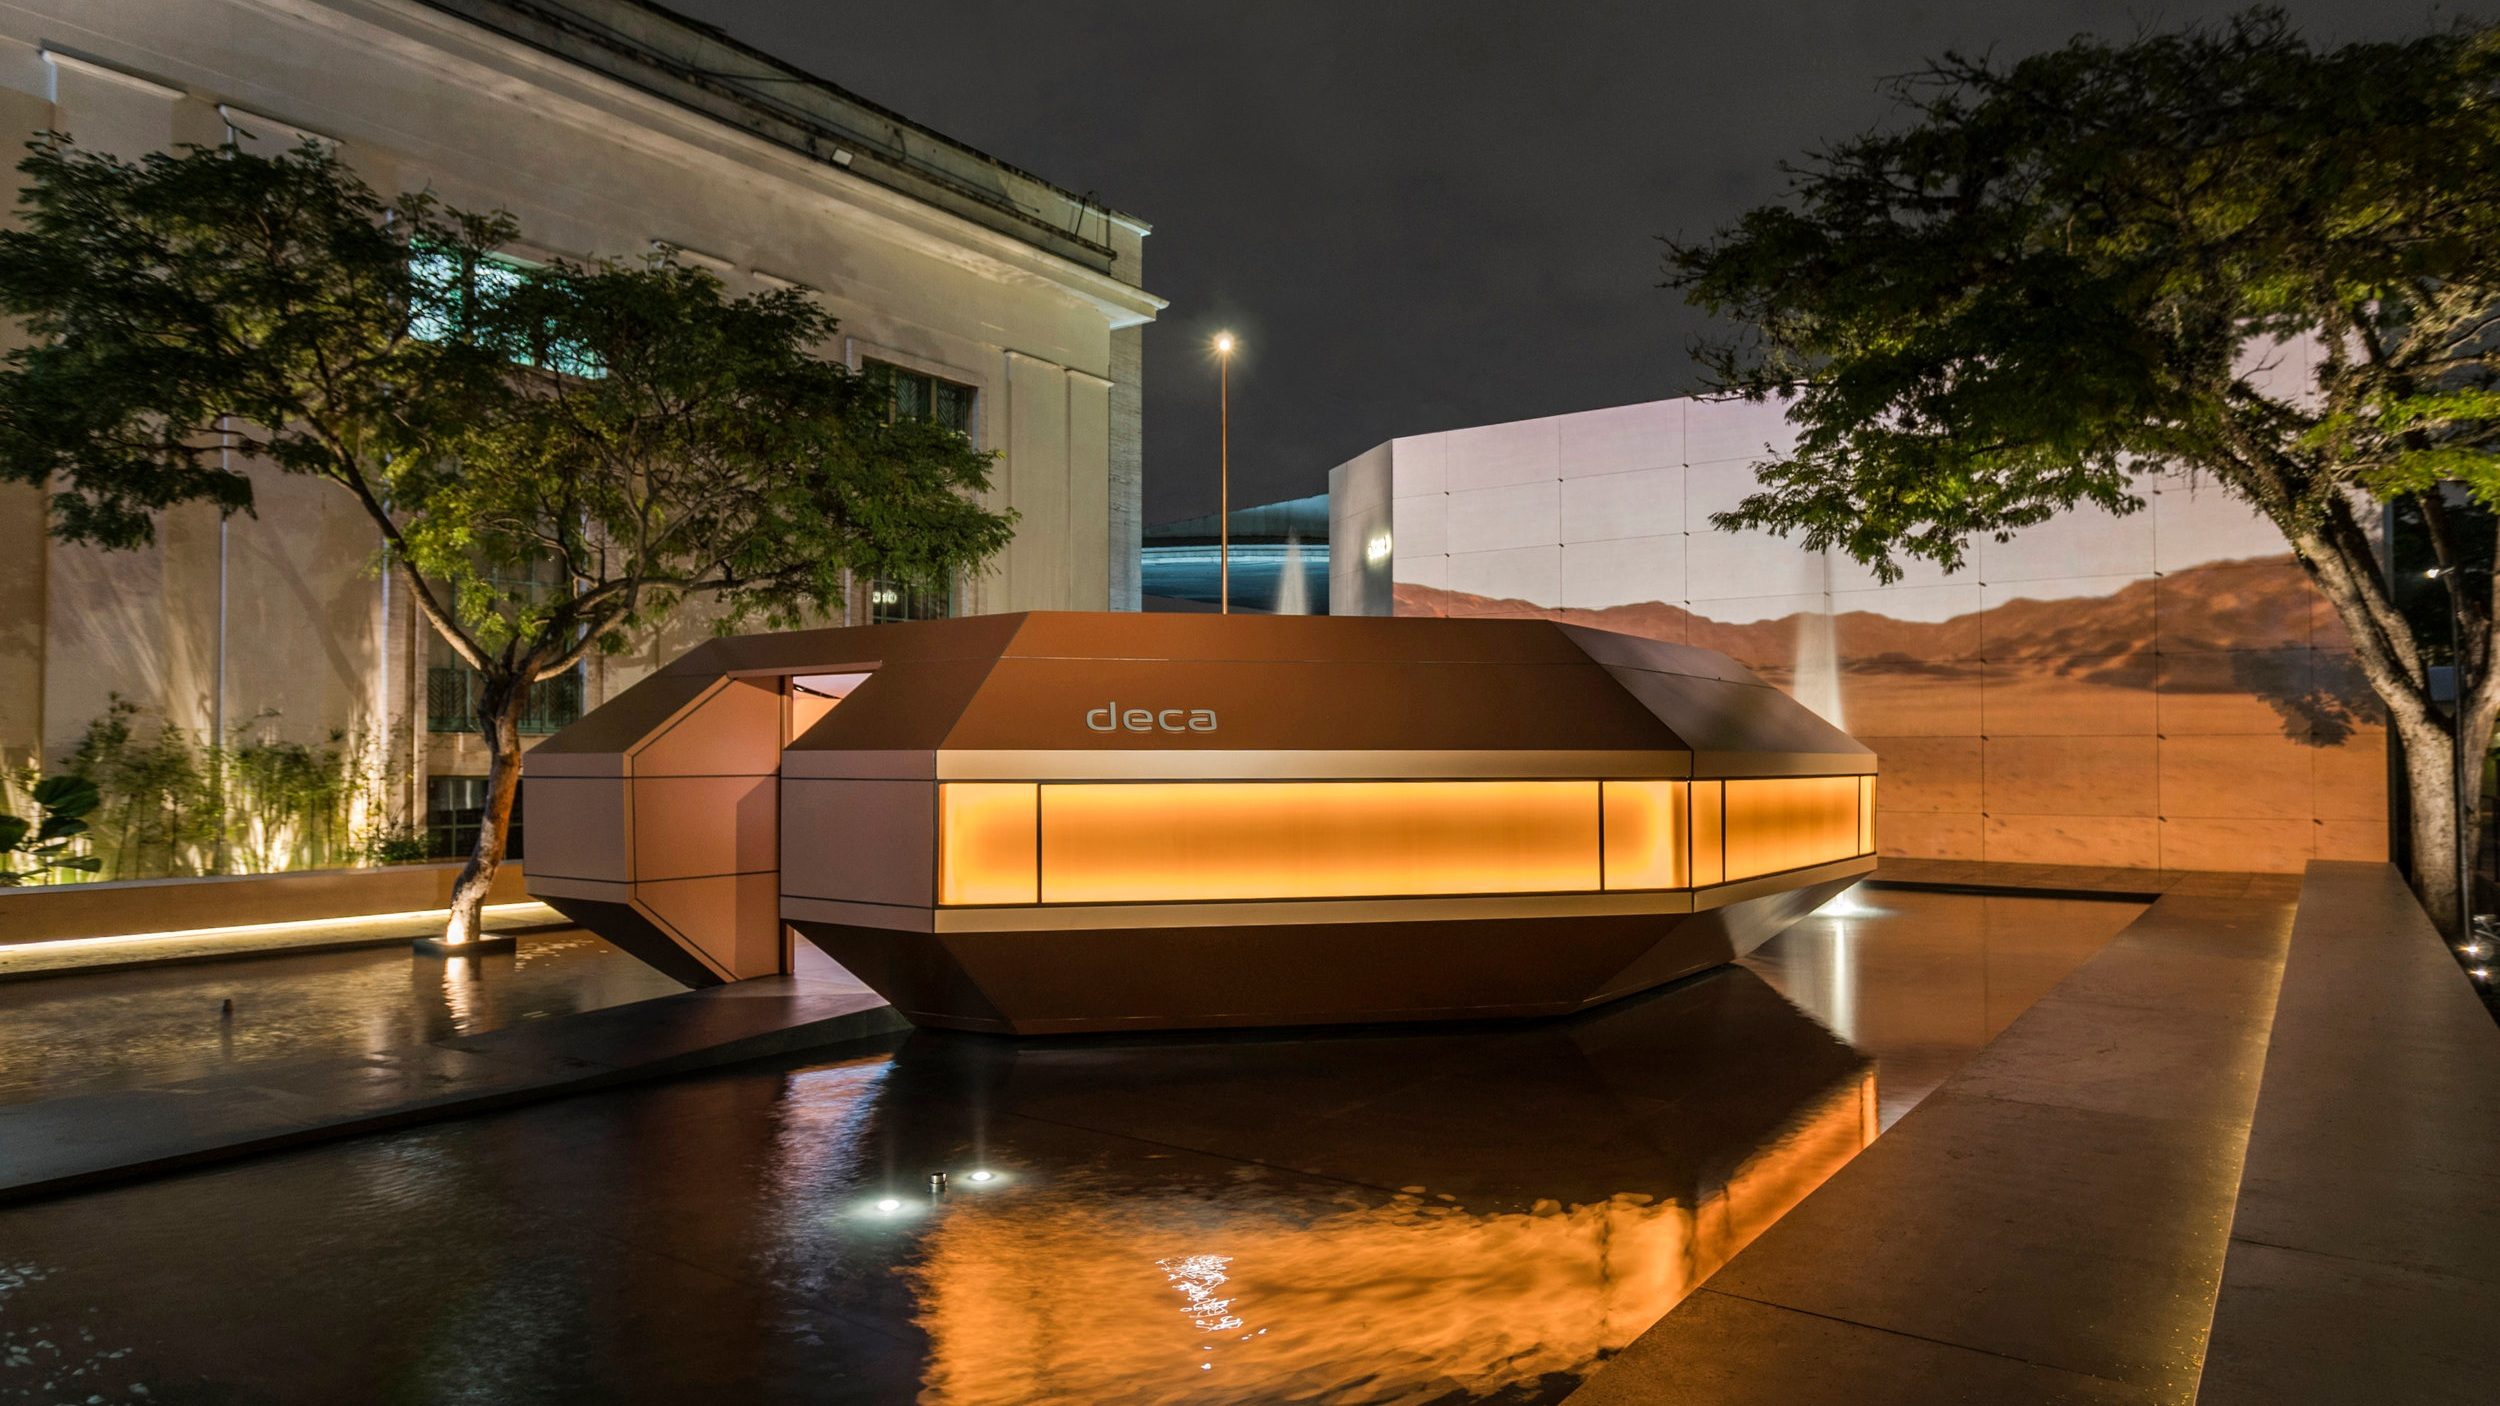 LIGHTSOURCE_CasaCor-SP-2019_Espaco-Deca_Studio-Bello-Dias_Carlos-Fortes_010.jpg